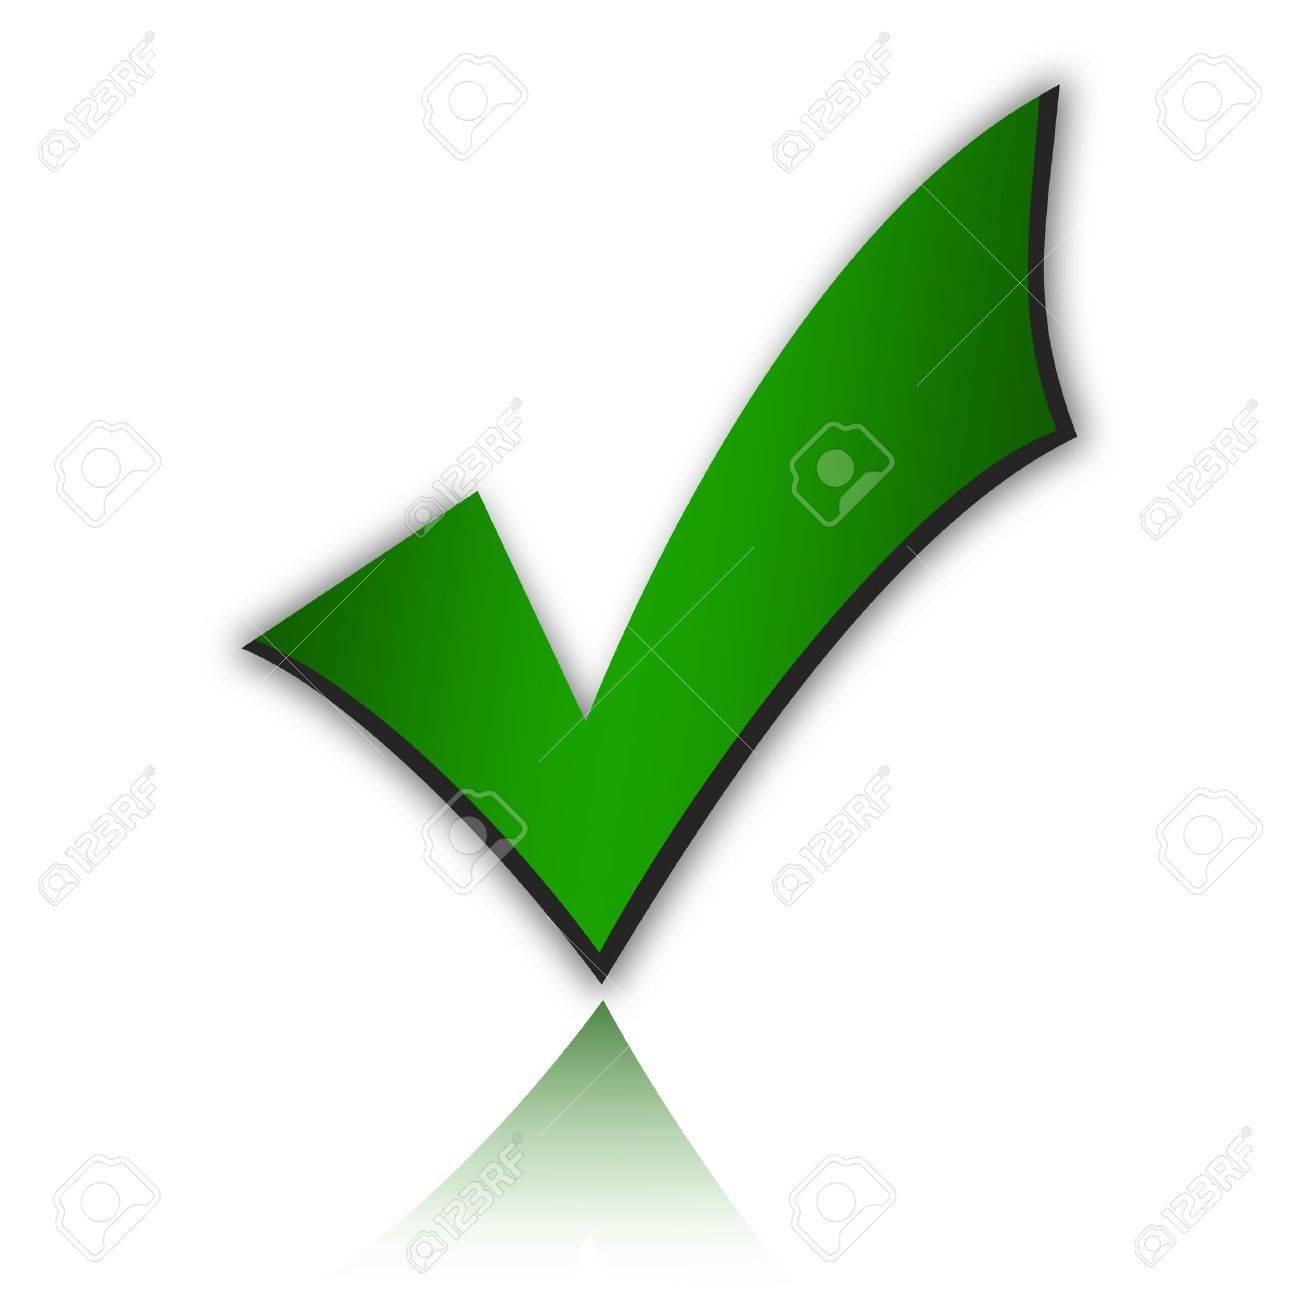 Green tick Stock Photo - 9156448